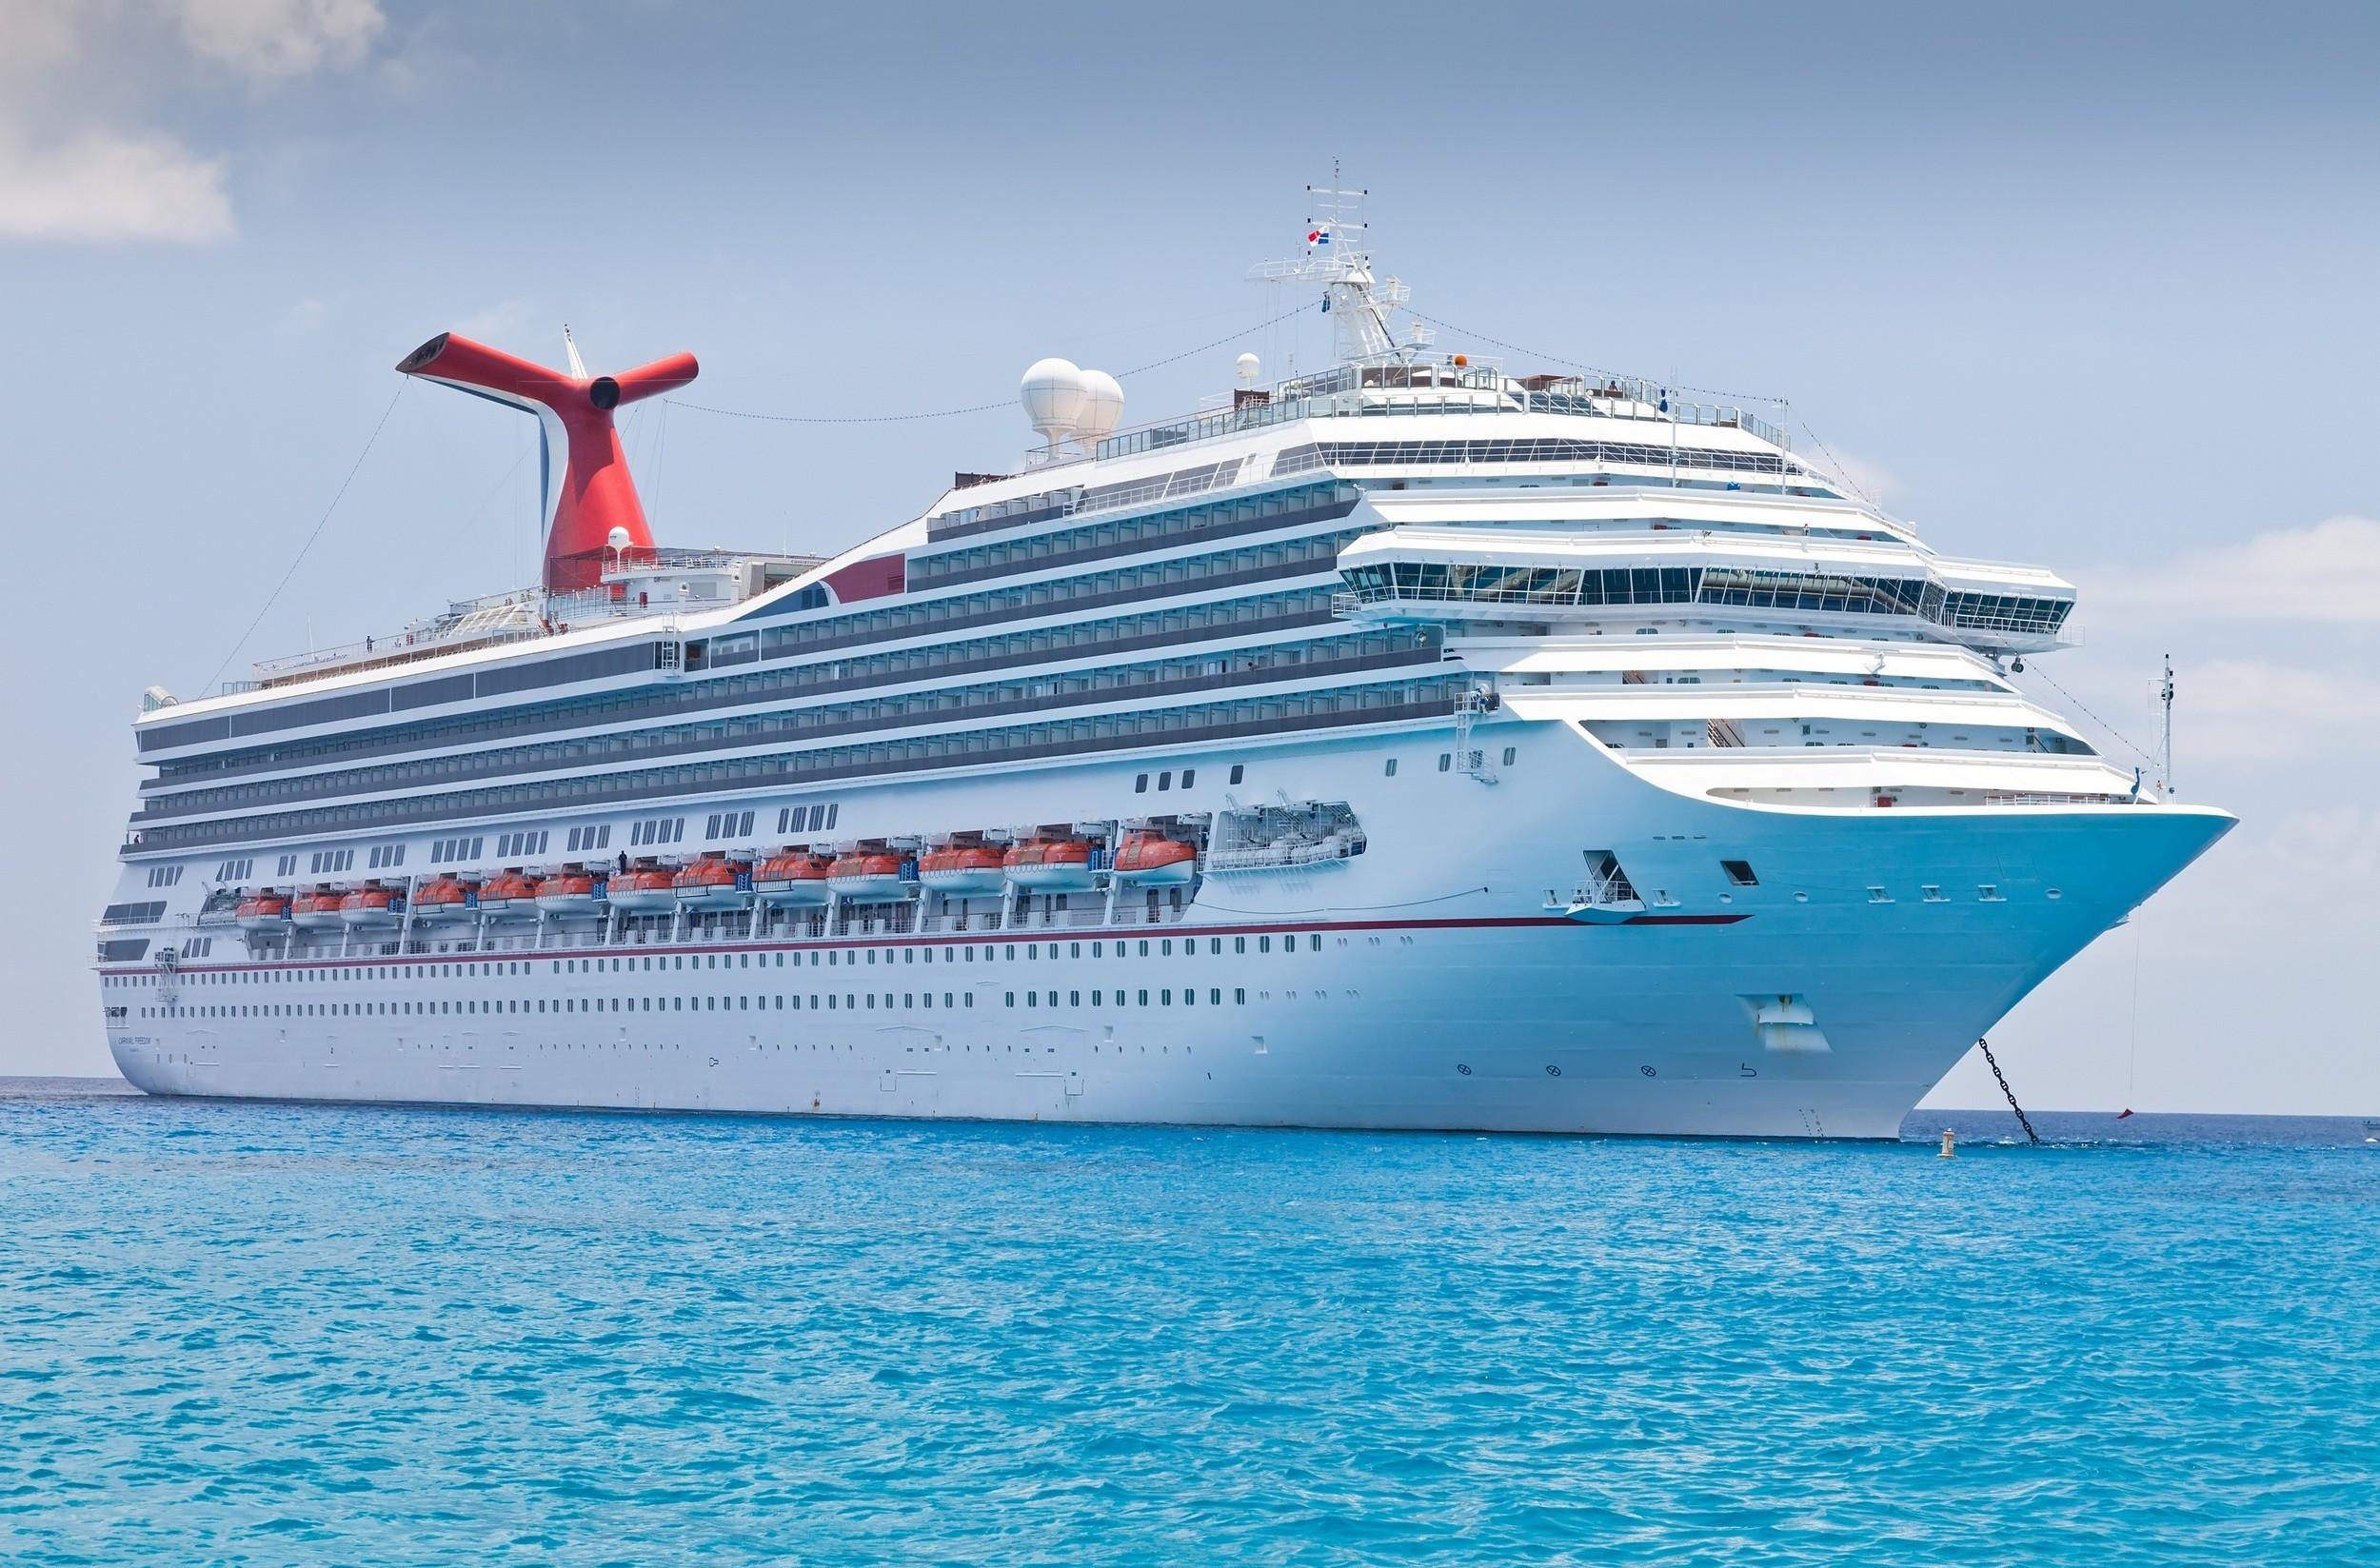 cruise ship wallpaper background - photo #15